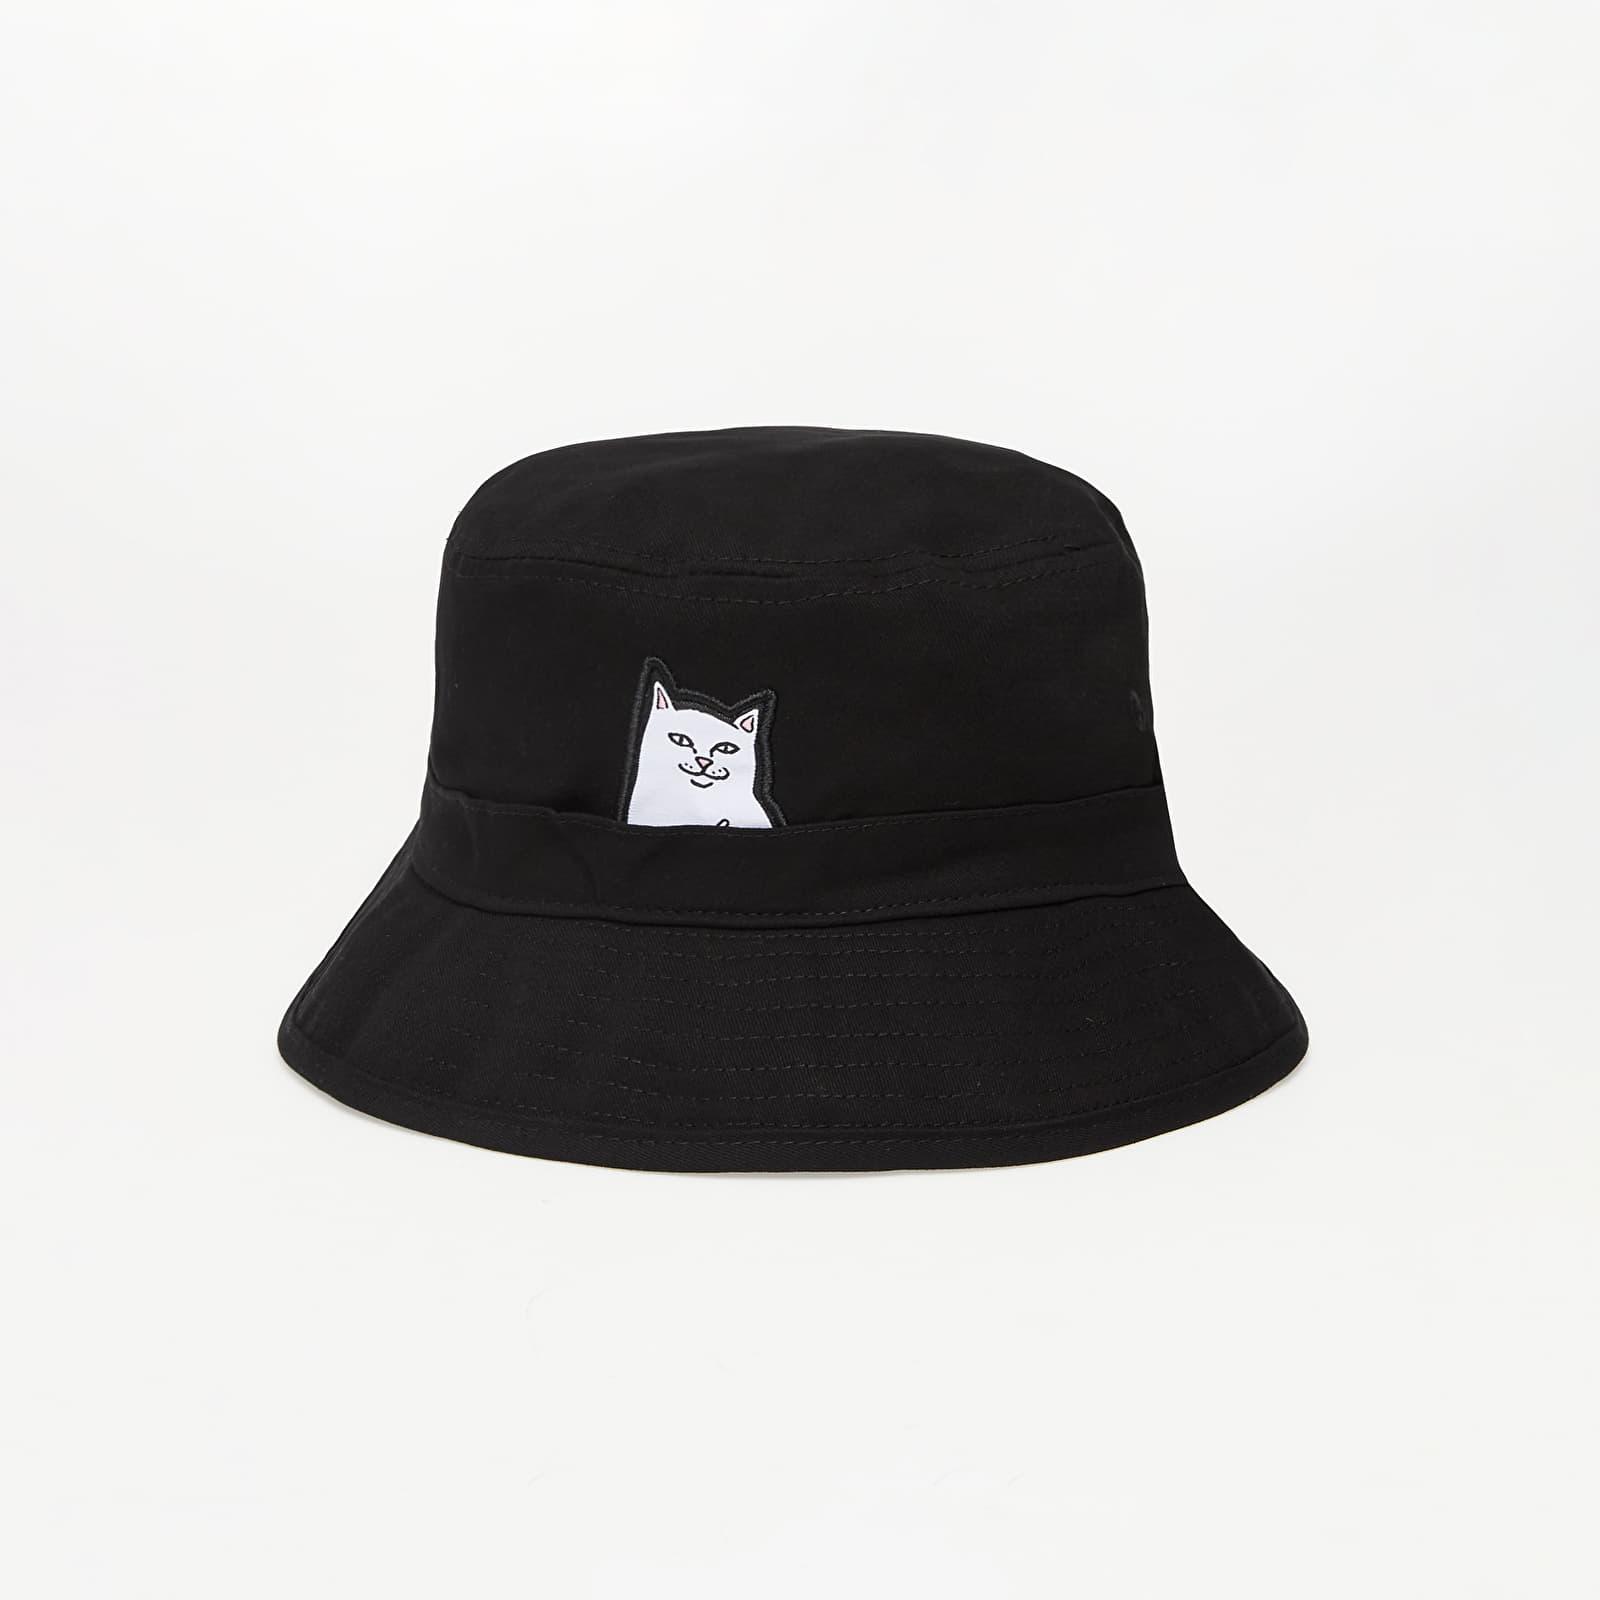 Klobouky RIPNDIP Lord Nermal Bucket Hat Black